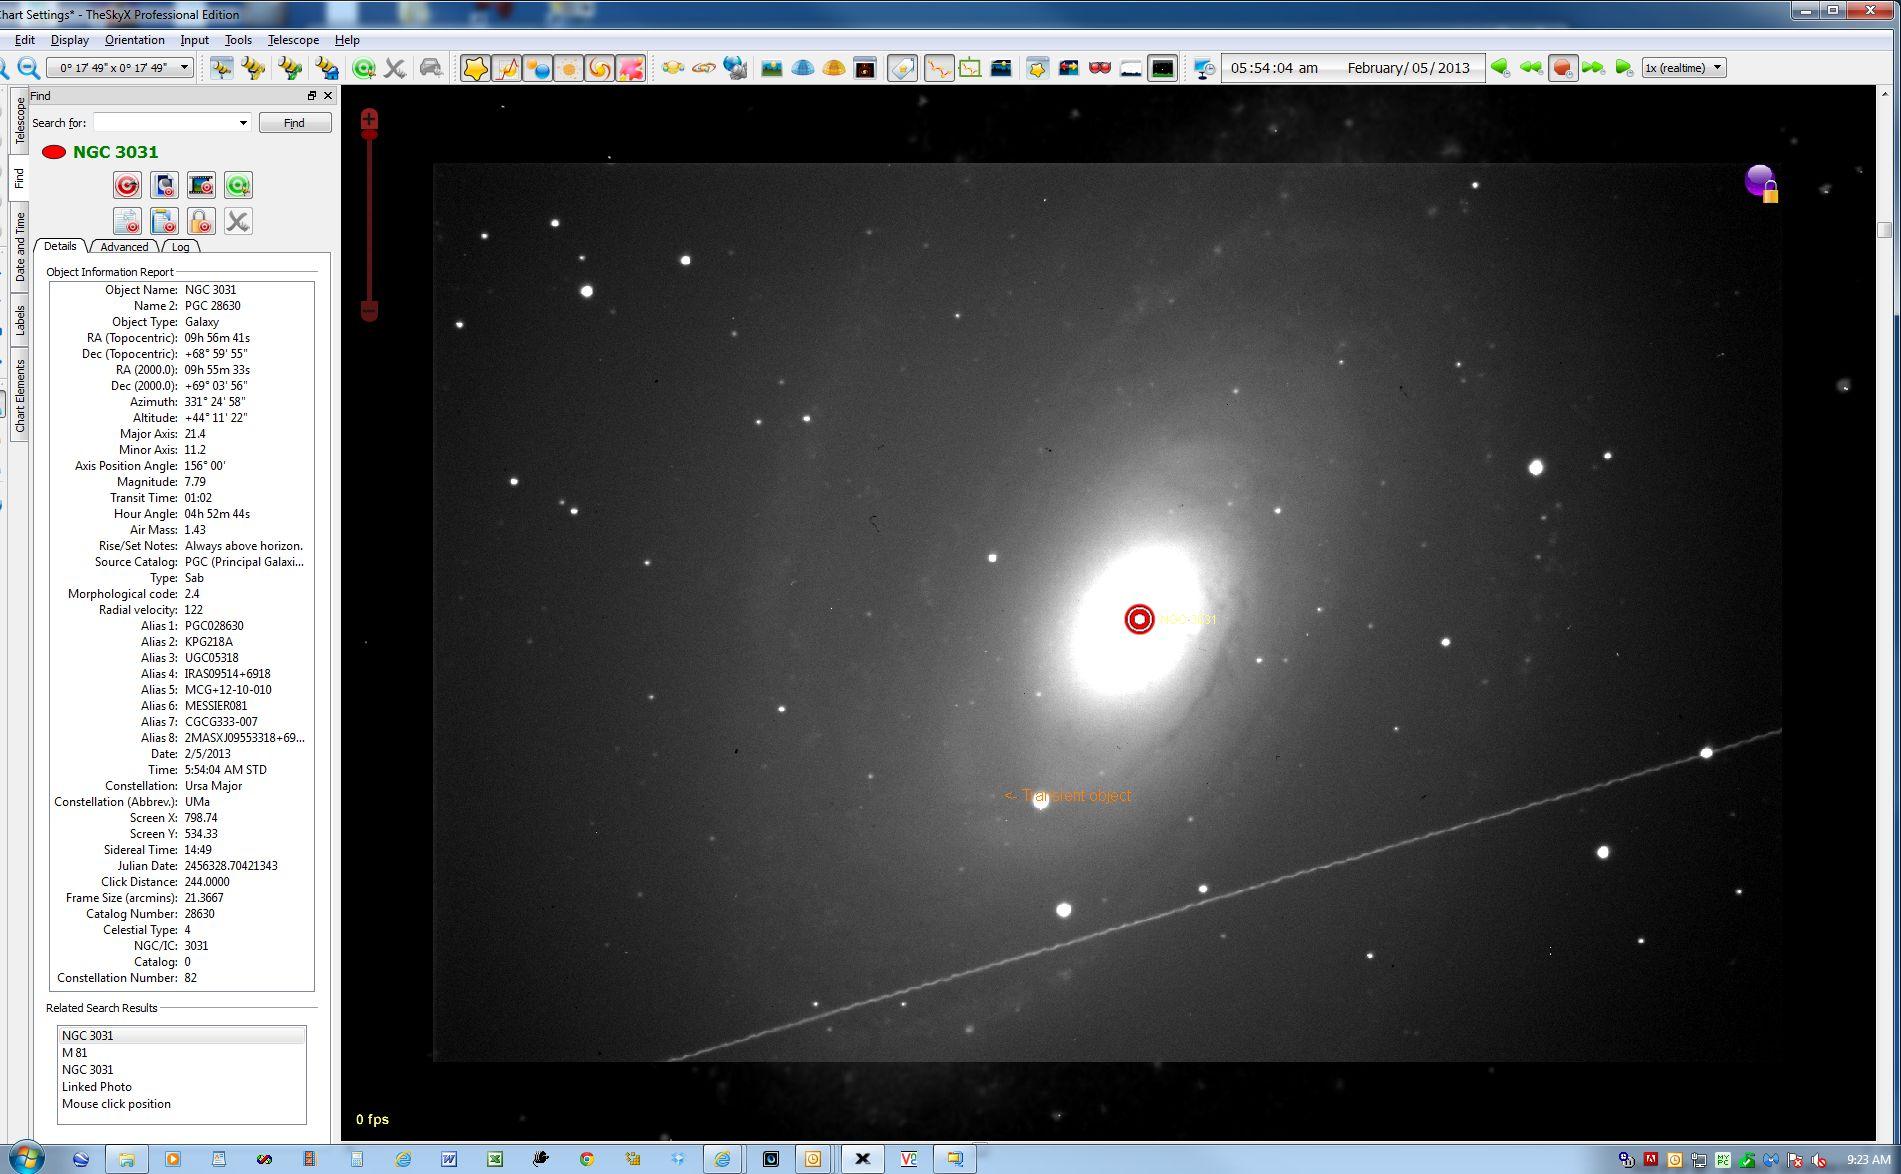 PNV J09555123+6901482 on 5 Feb. 2013